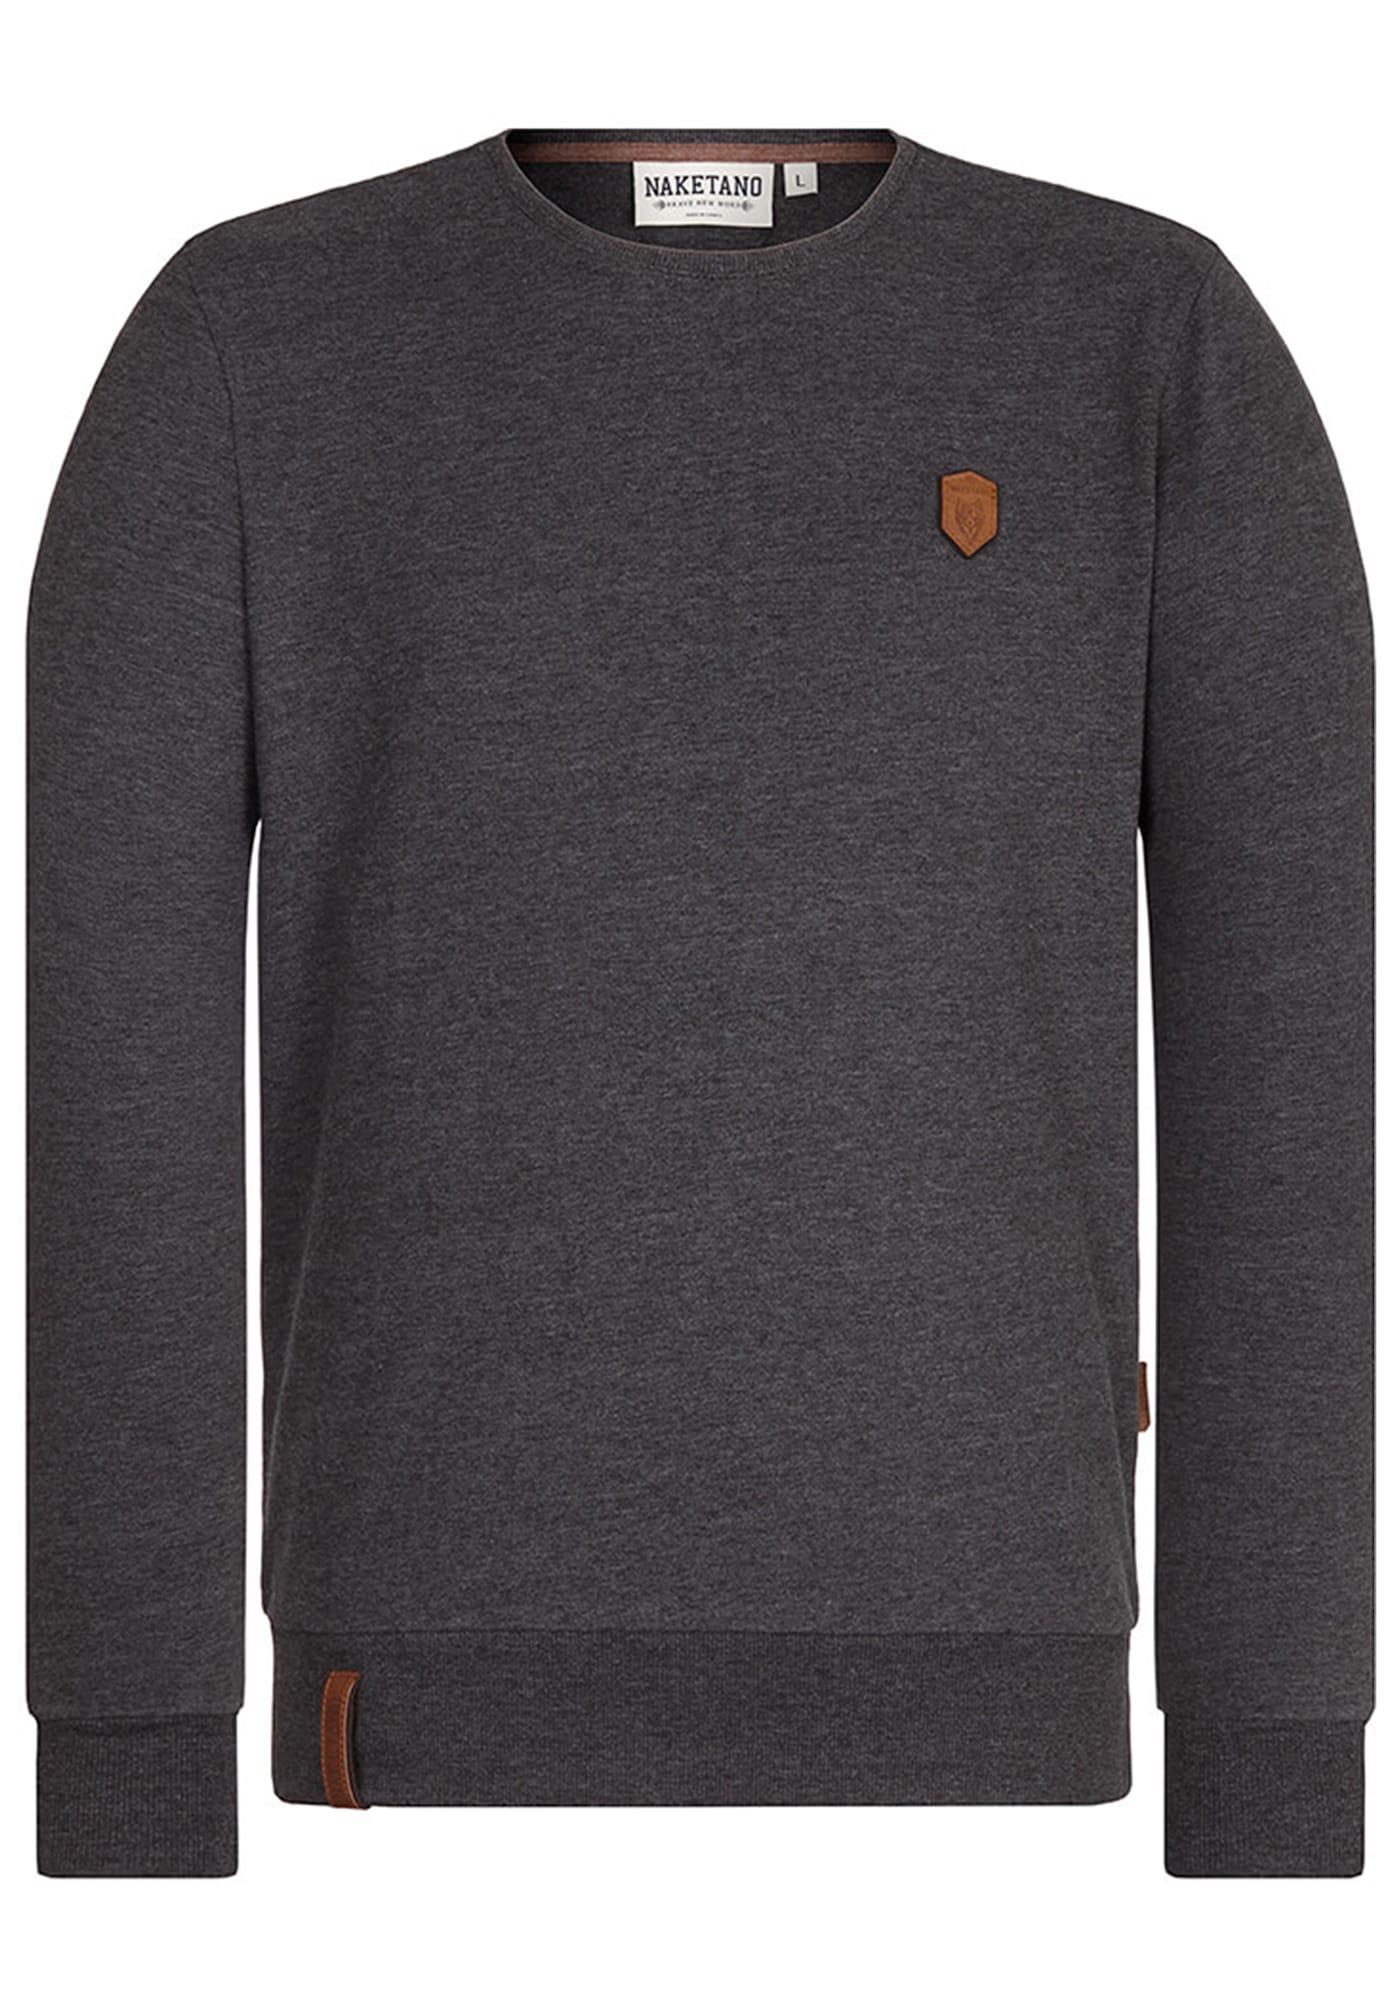 Sweatshirt 'Al K.Ohol' | Bekleidung > Sweatshirts & -jacken > Sweatshirts | Anthrazit | Naketano